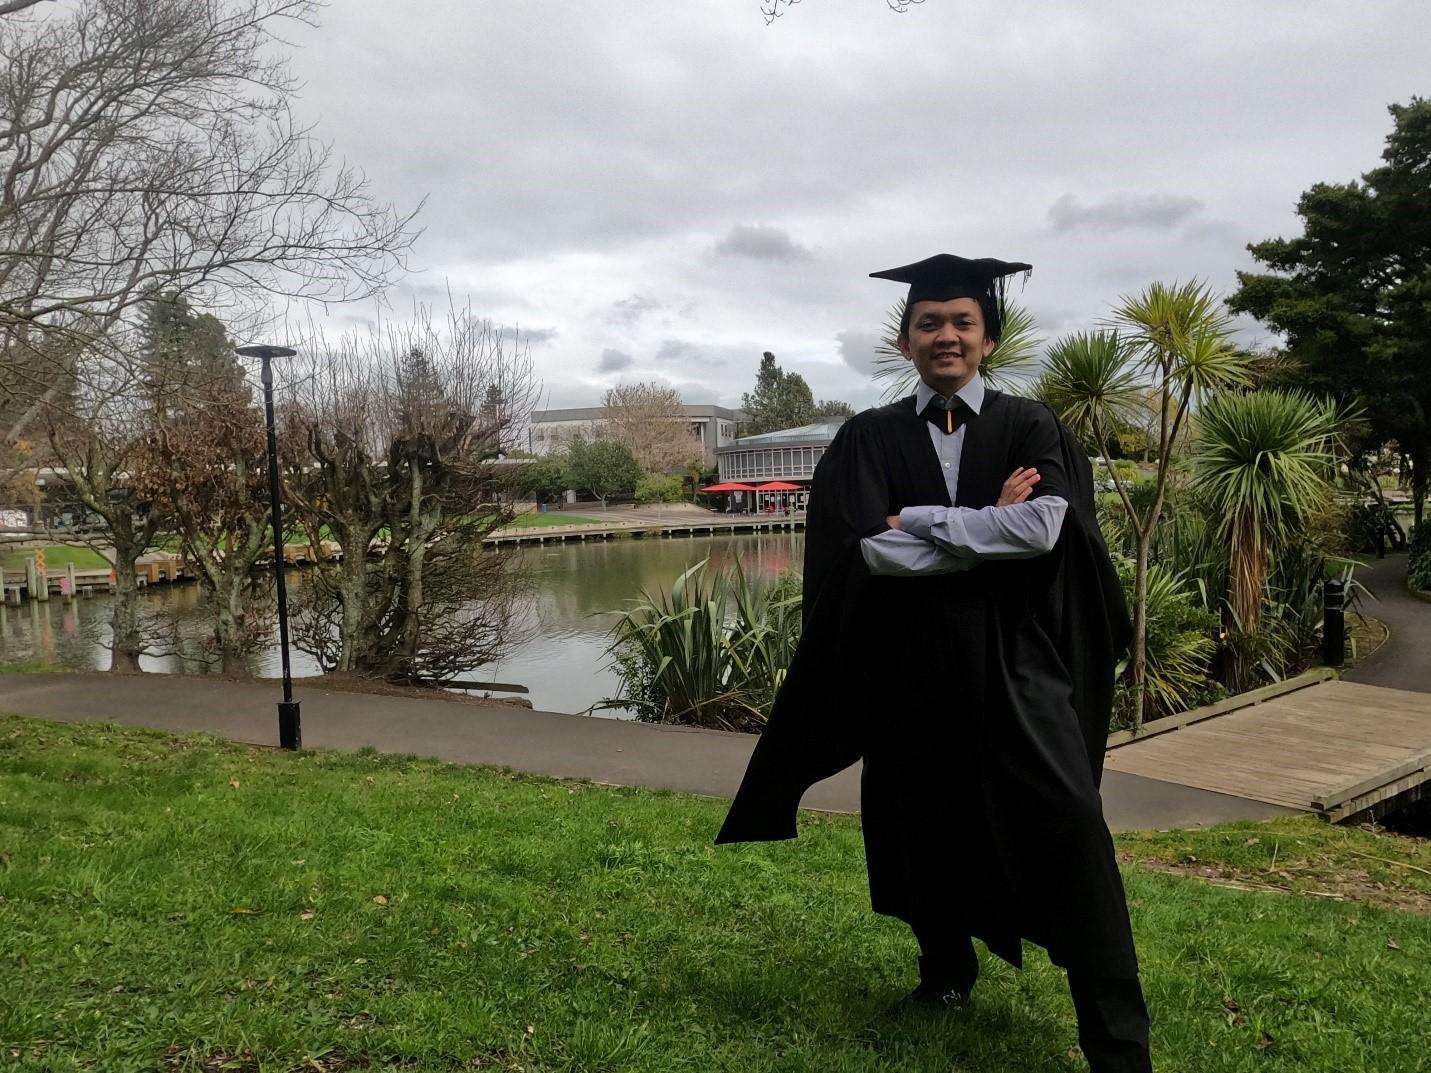 Sandhi Satyatama saat kegiatan wisuda di University of Waikato. Sumber: Dokumentasi pribadi